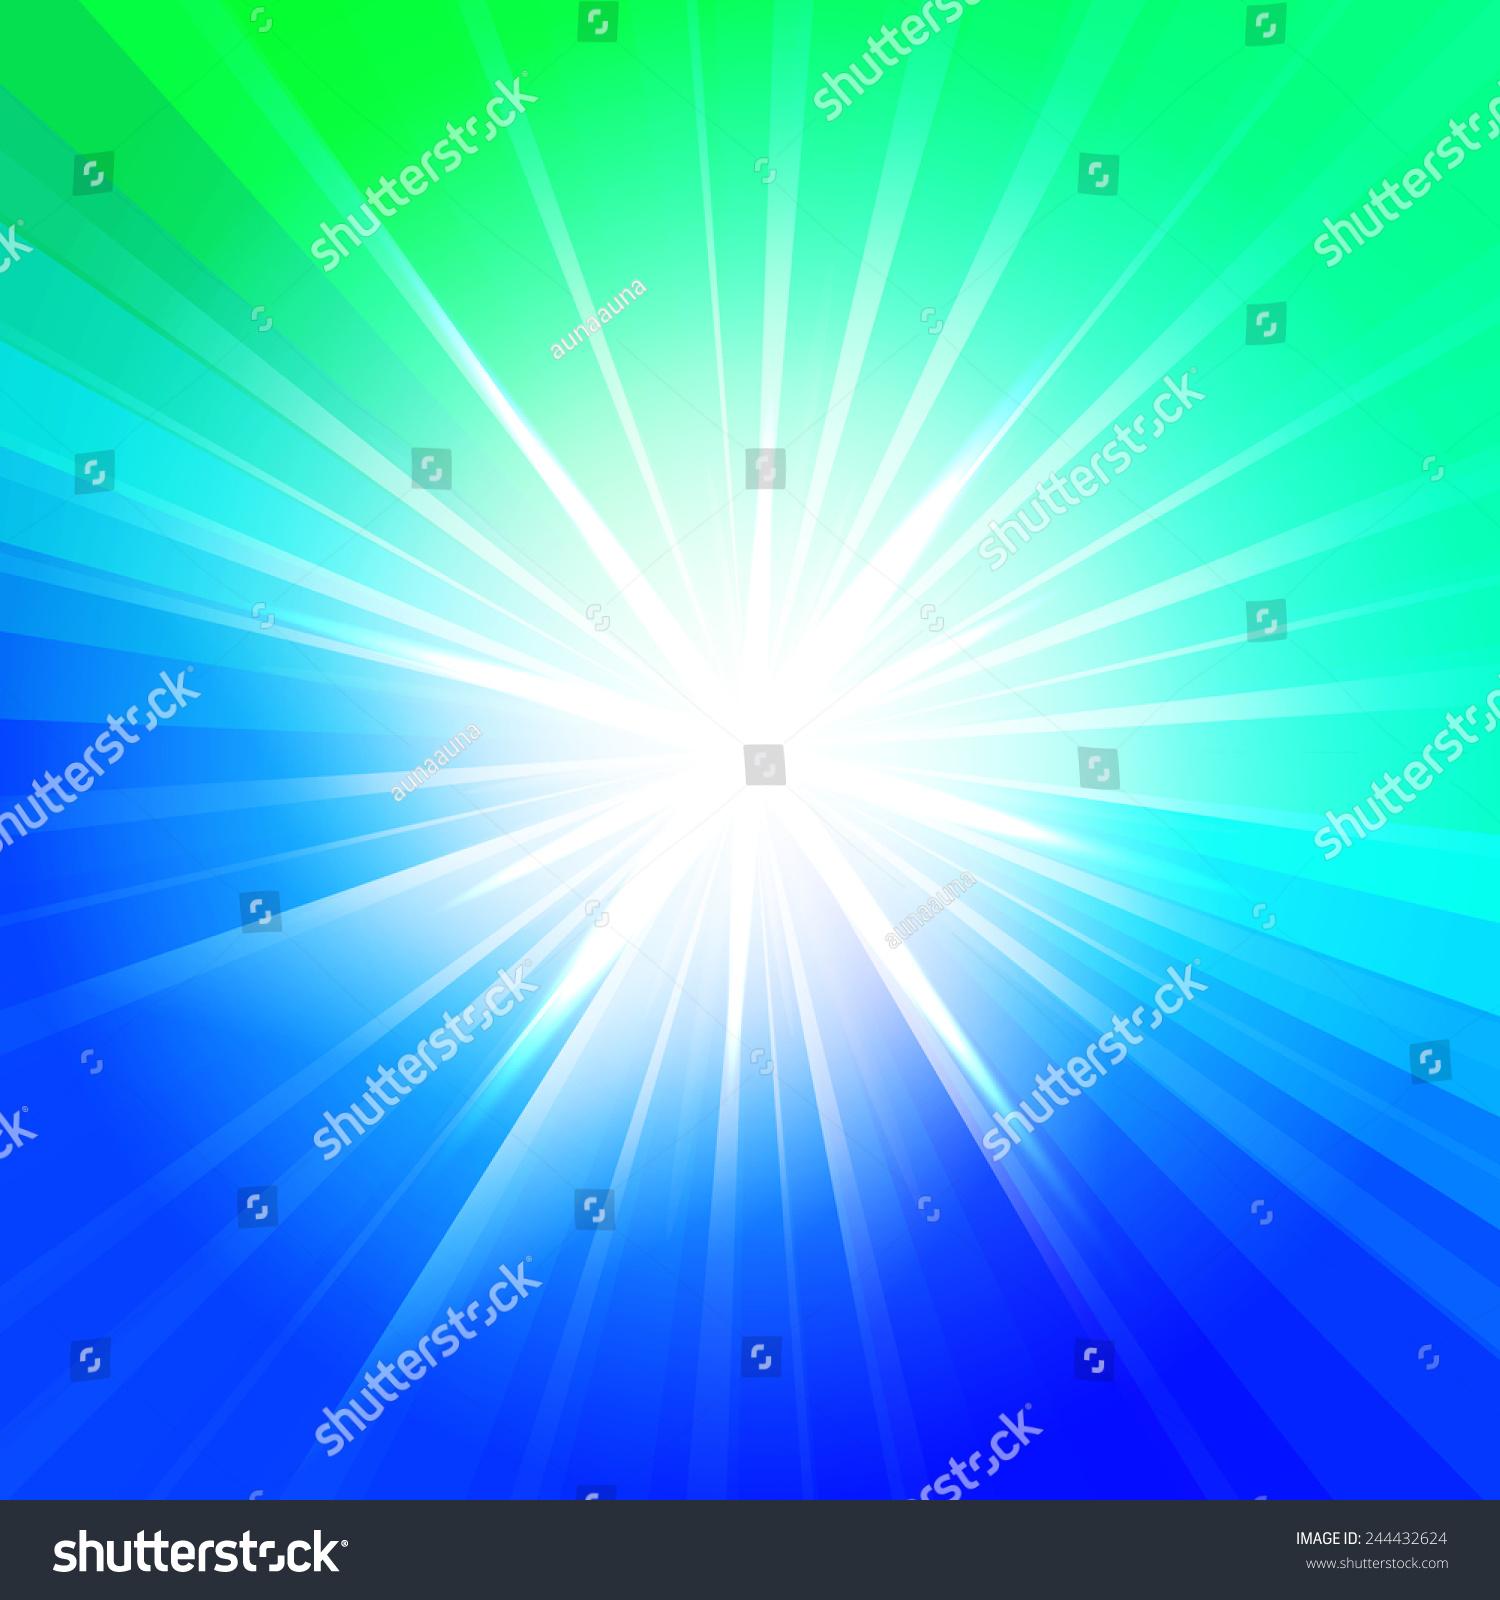 Green Desktop Wallpaper: Abstract Star Blue Green Colors Vector Stock Vector